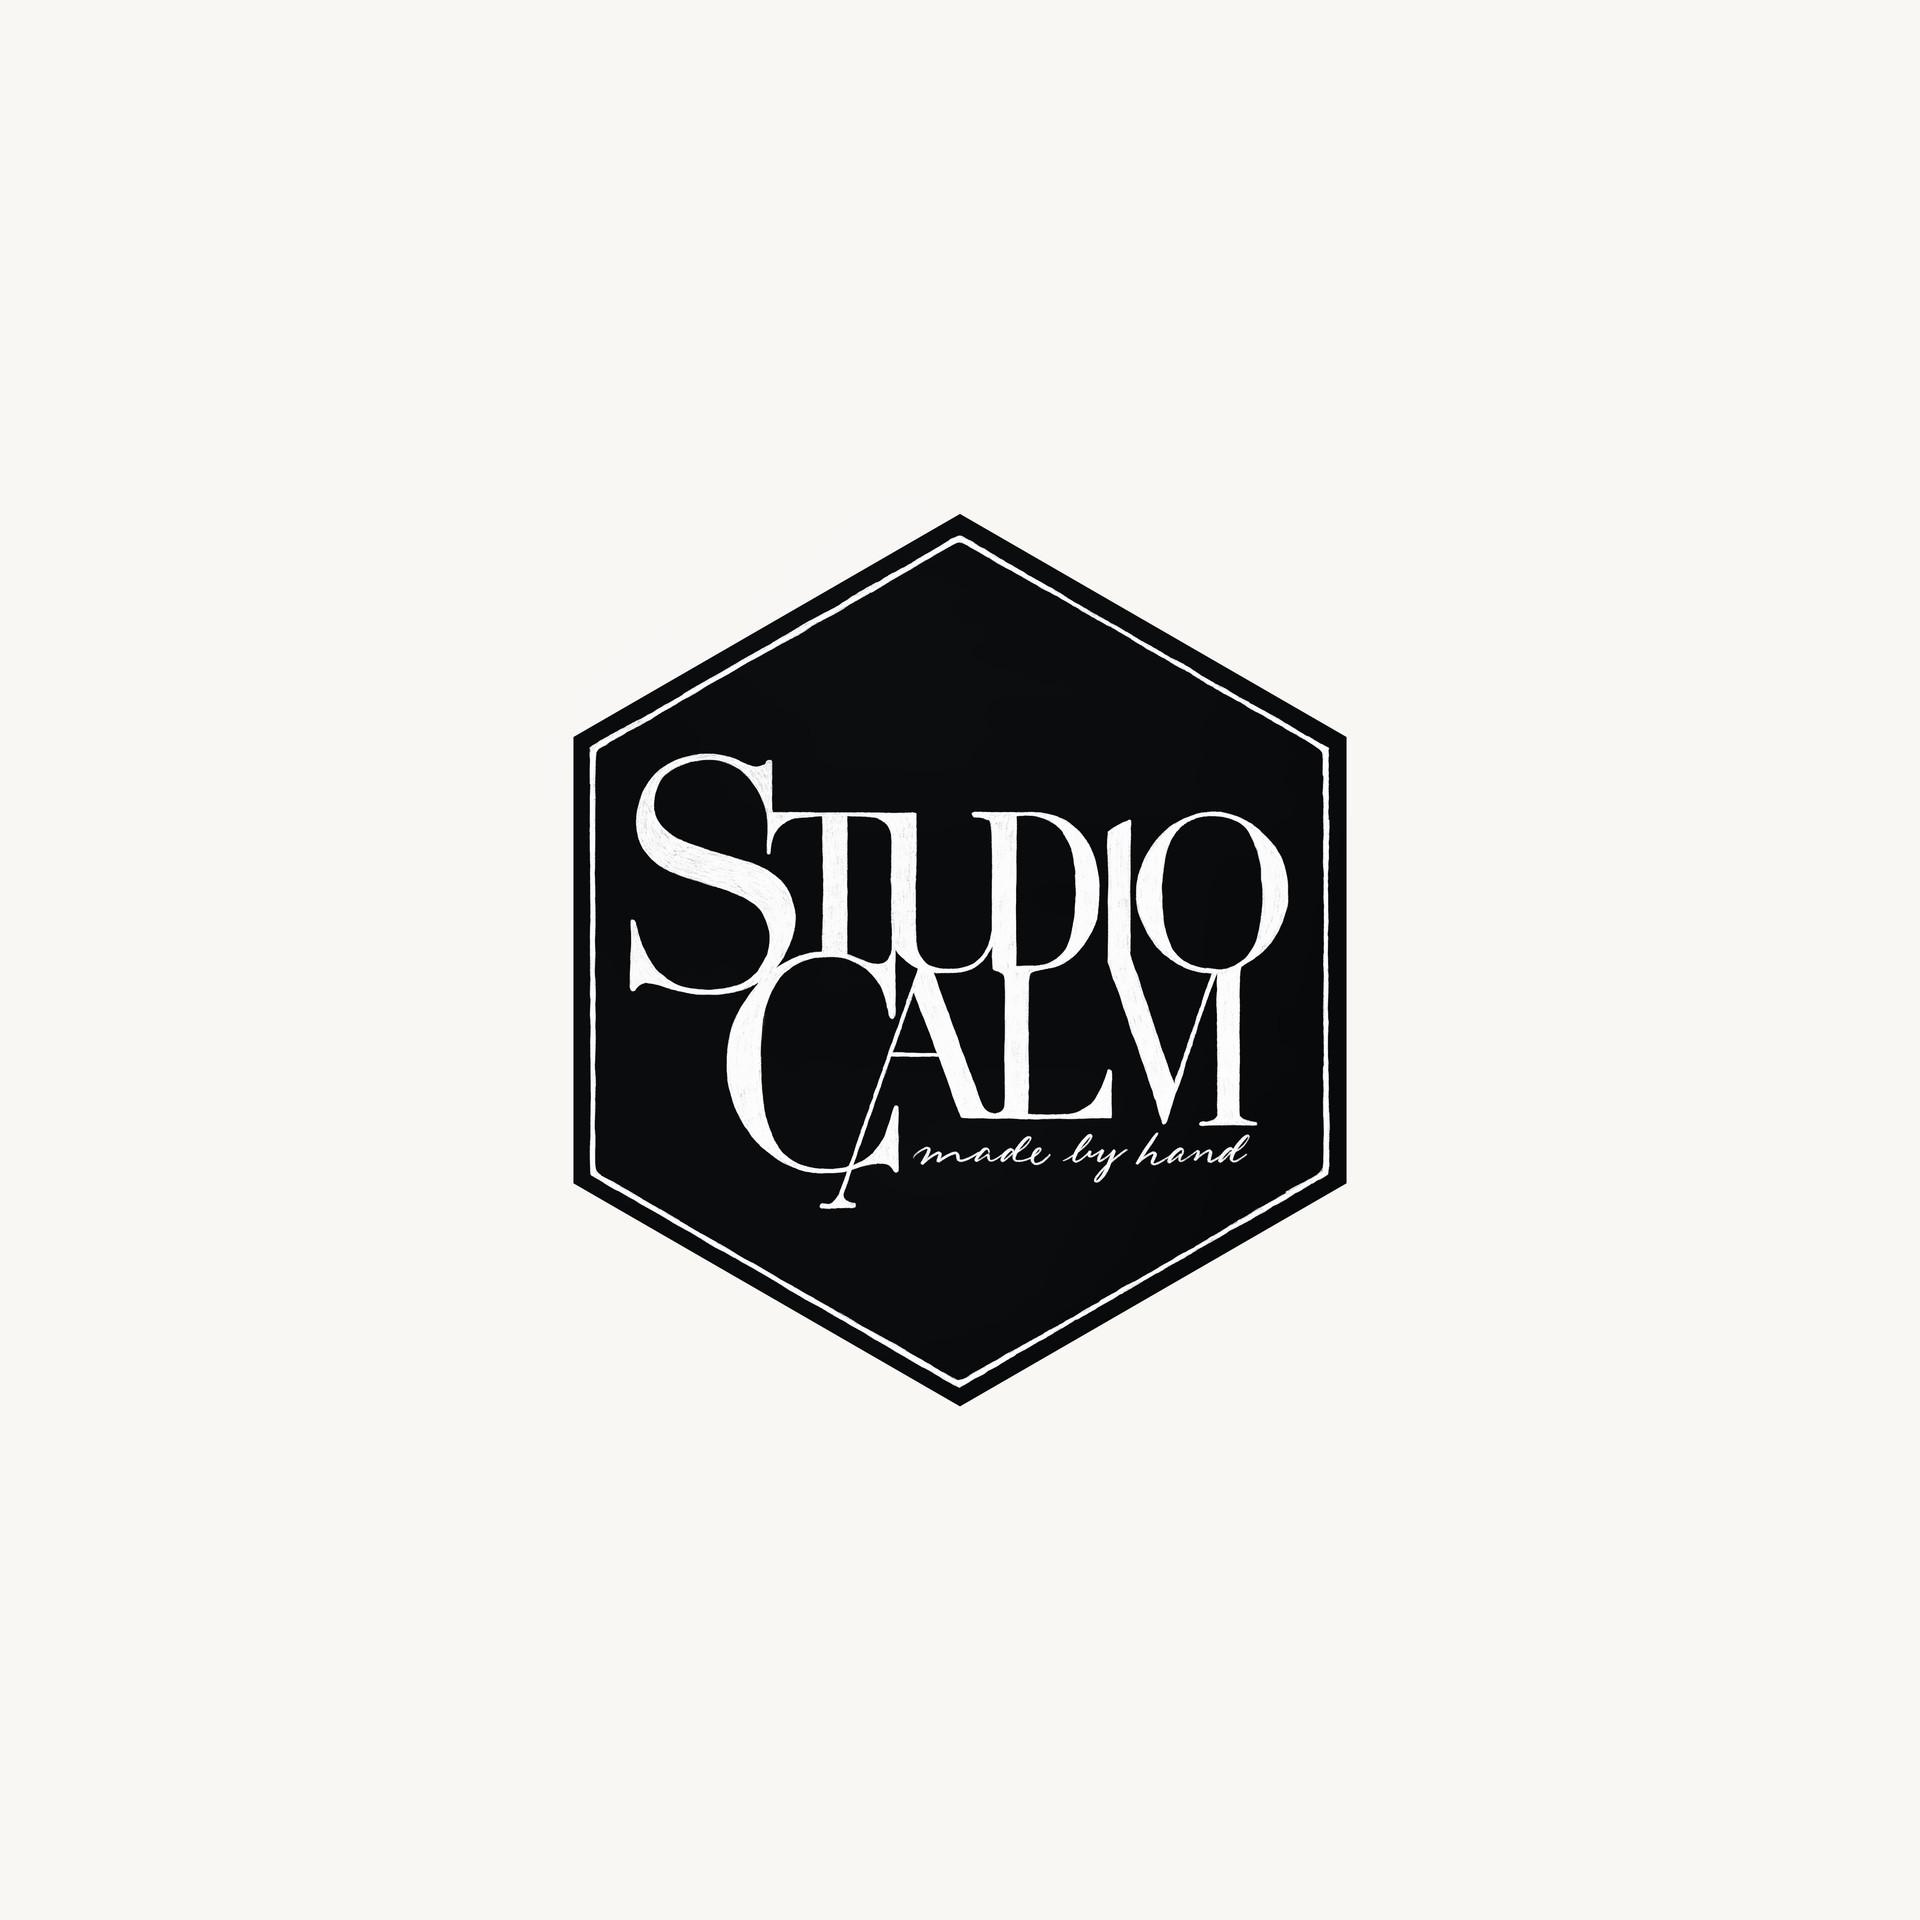 studio calm fix高画質2.jpg